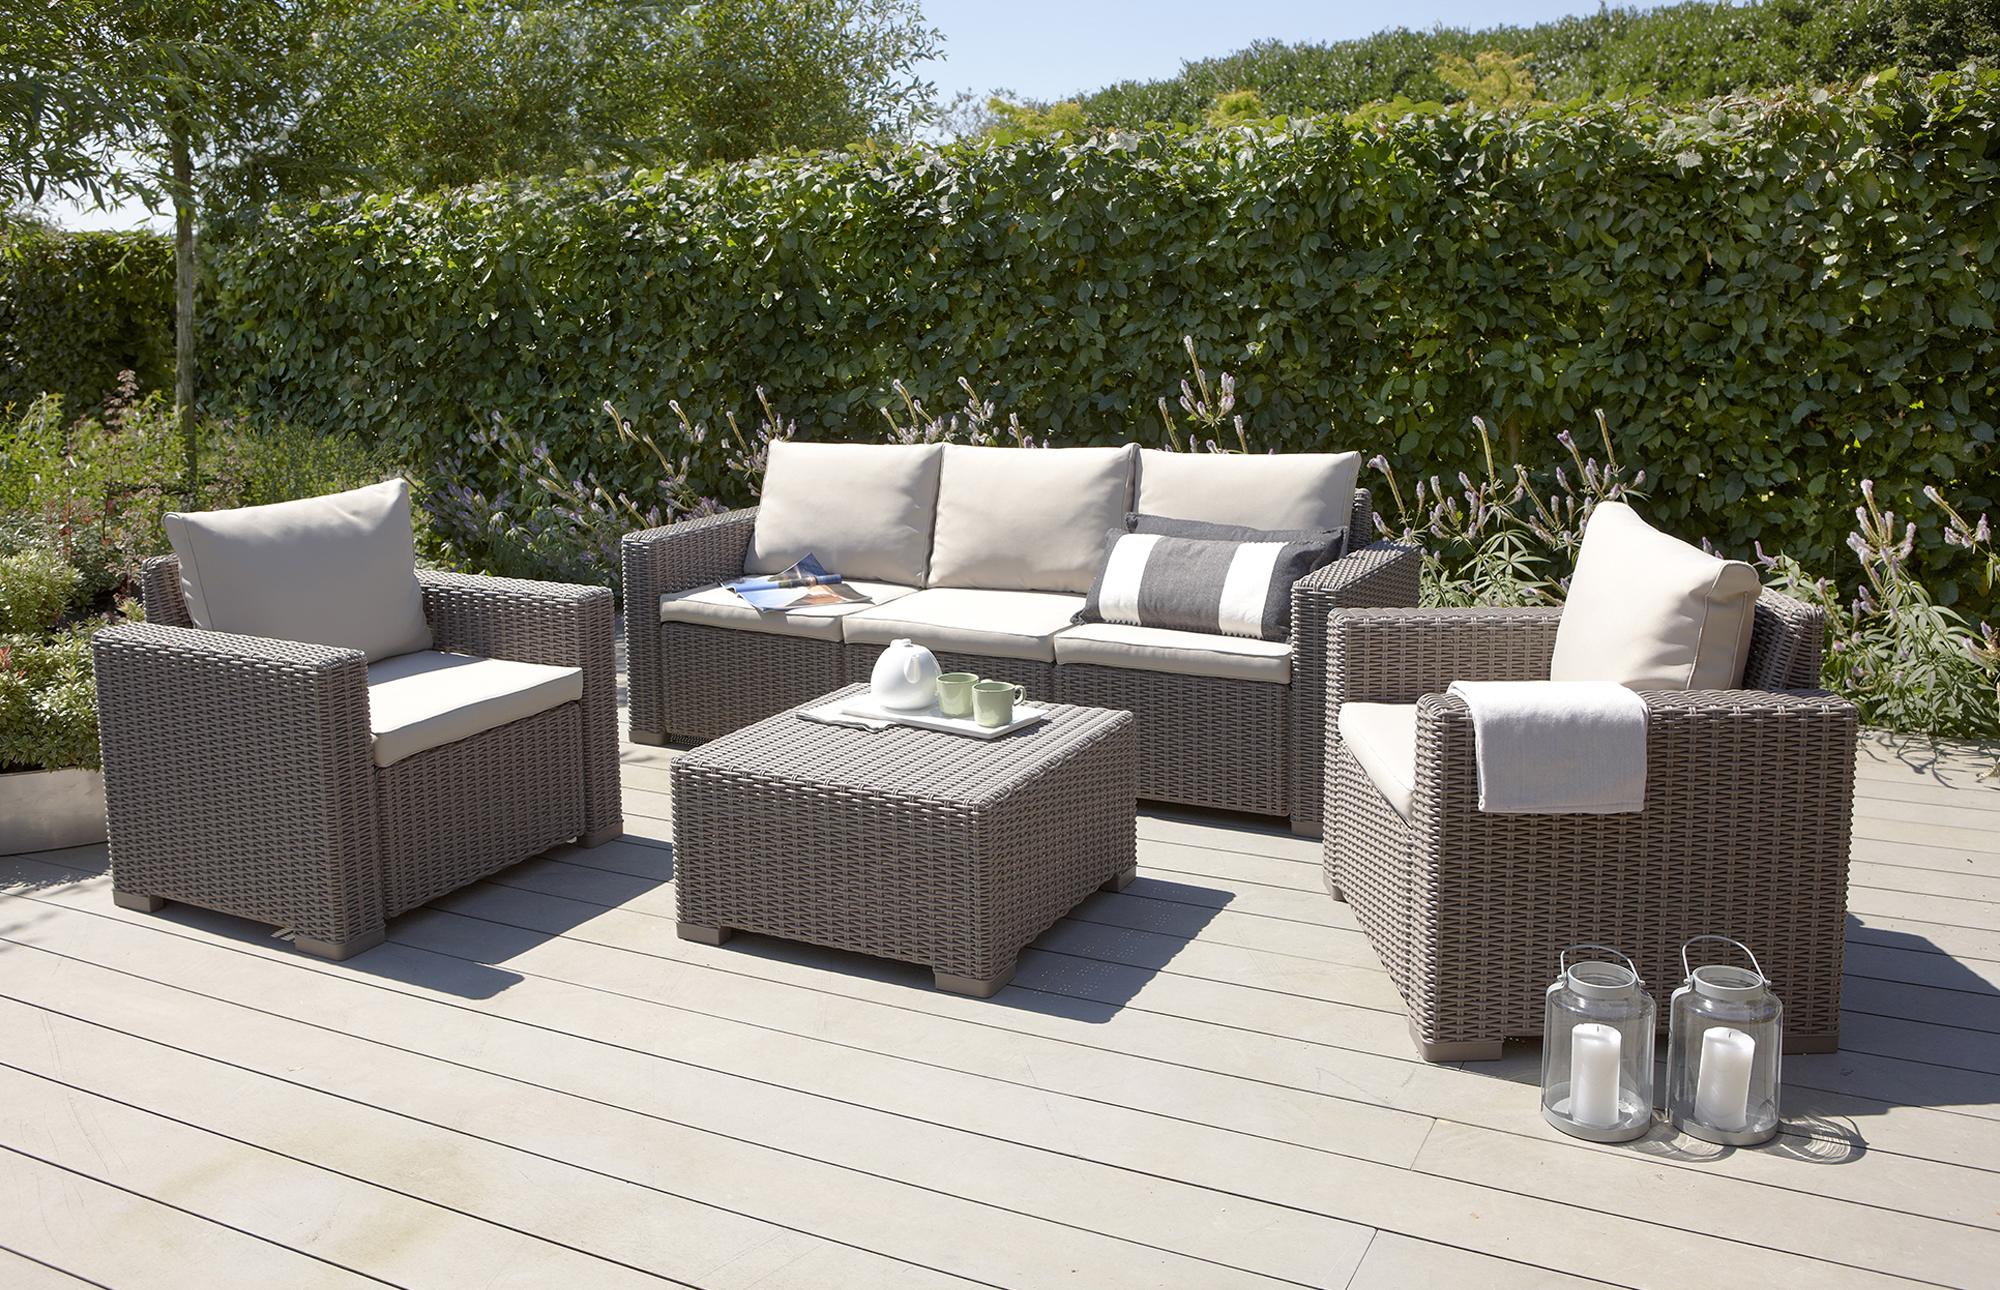 outdoor rattan furniture garden-furniture-rattan-sets-breathtaking-rattan-garden-furniture-bistro- sets-breathtaking-outdoor-patio-furniture-covers - rattan garden furniture  sets ... PMNXQMJ